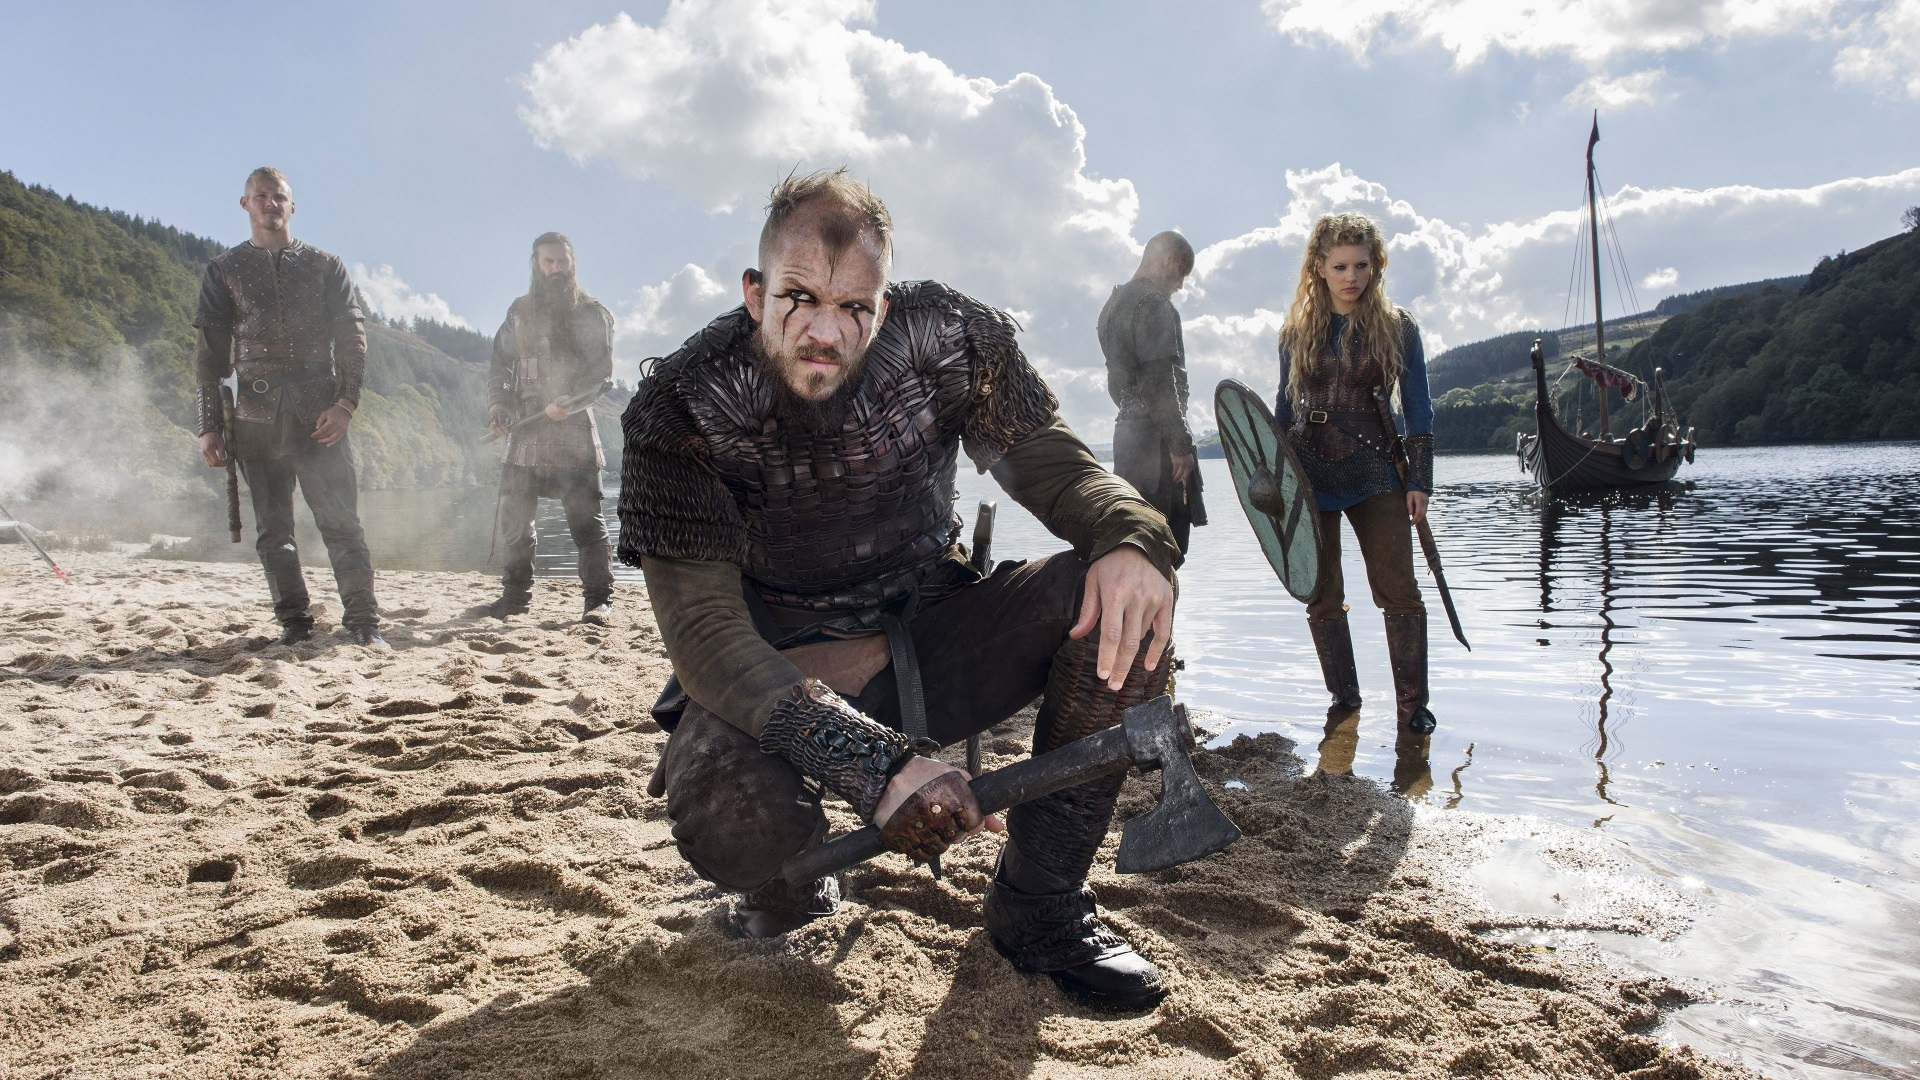 Vikings Fond d'écran HD | Arrière-Plan | 1920x1080 | ID:691802 - Wallpaper Abyss